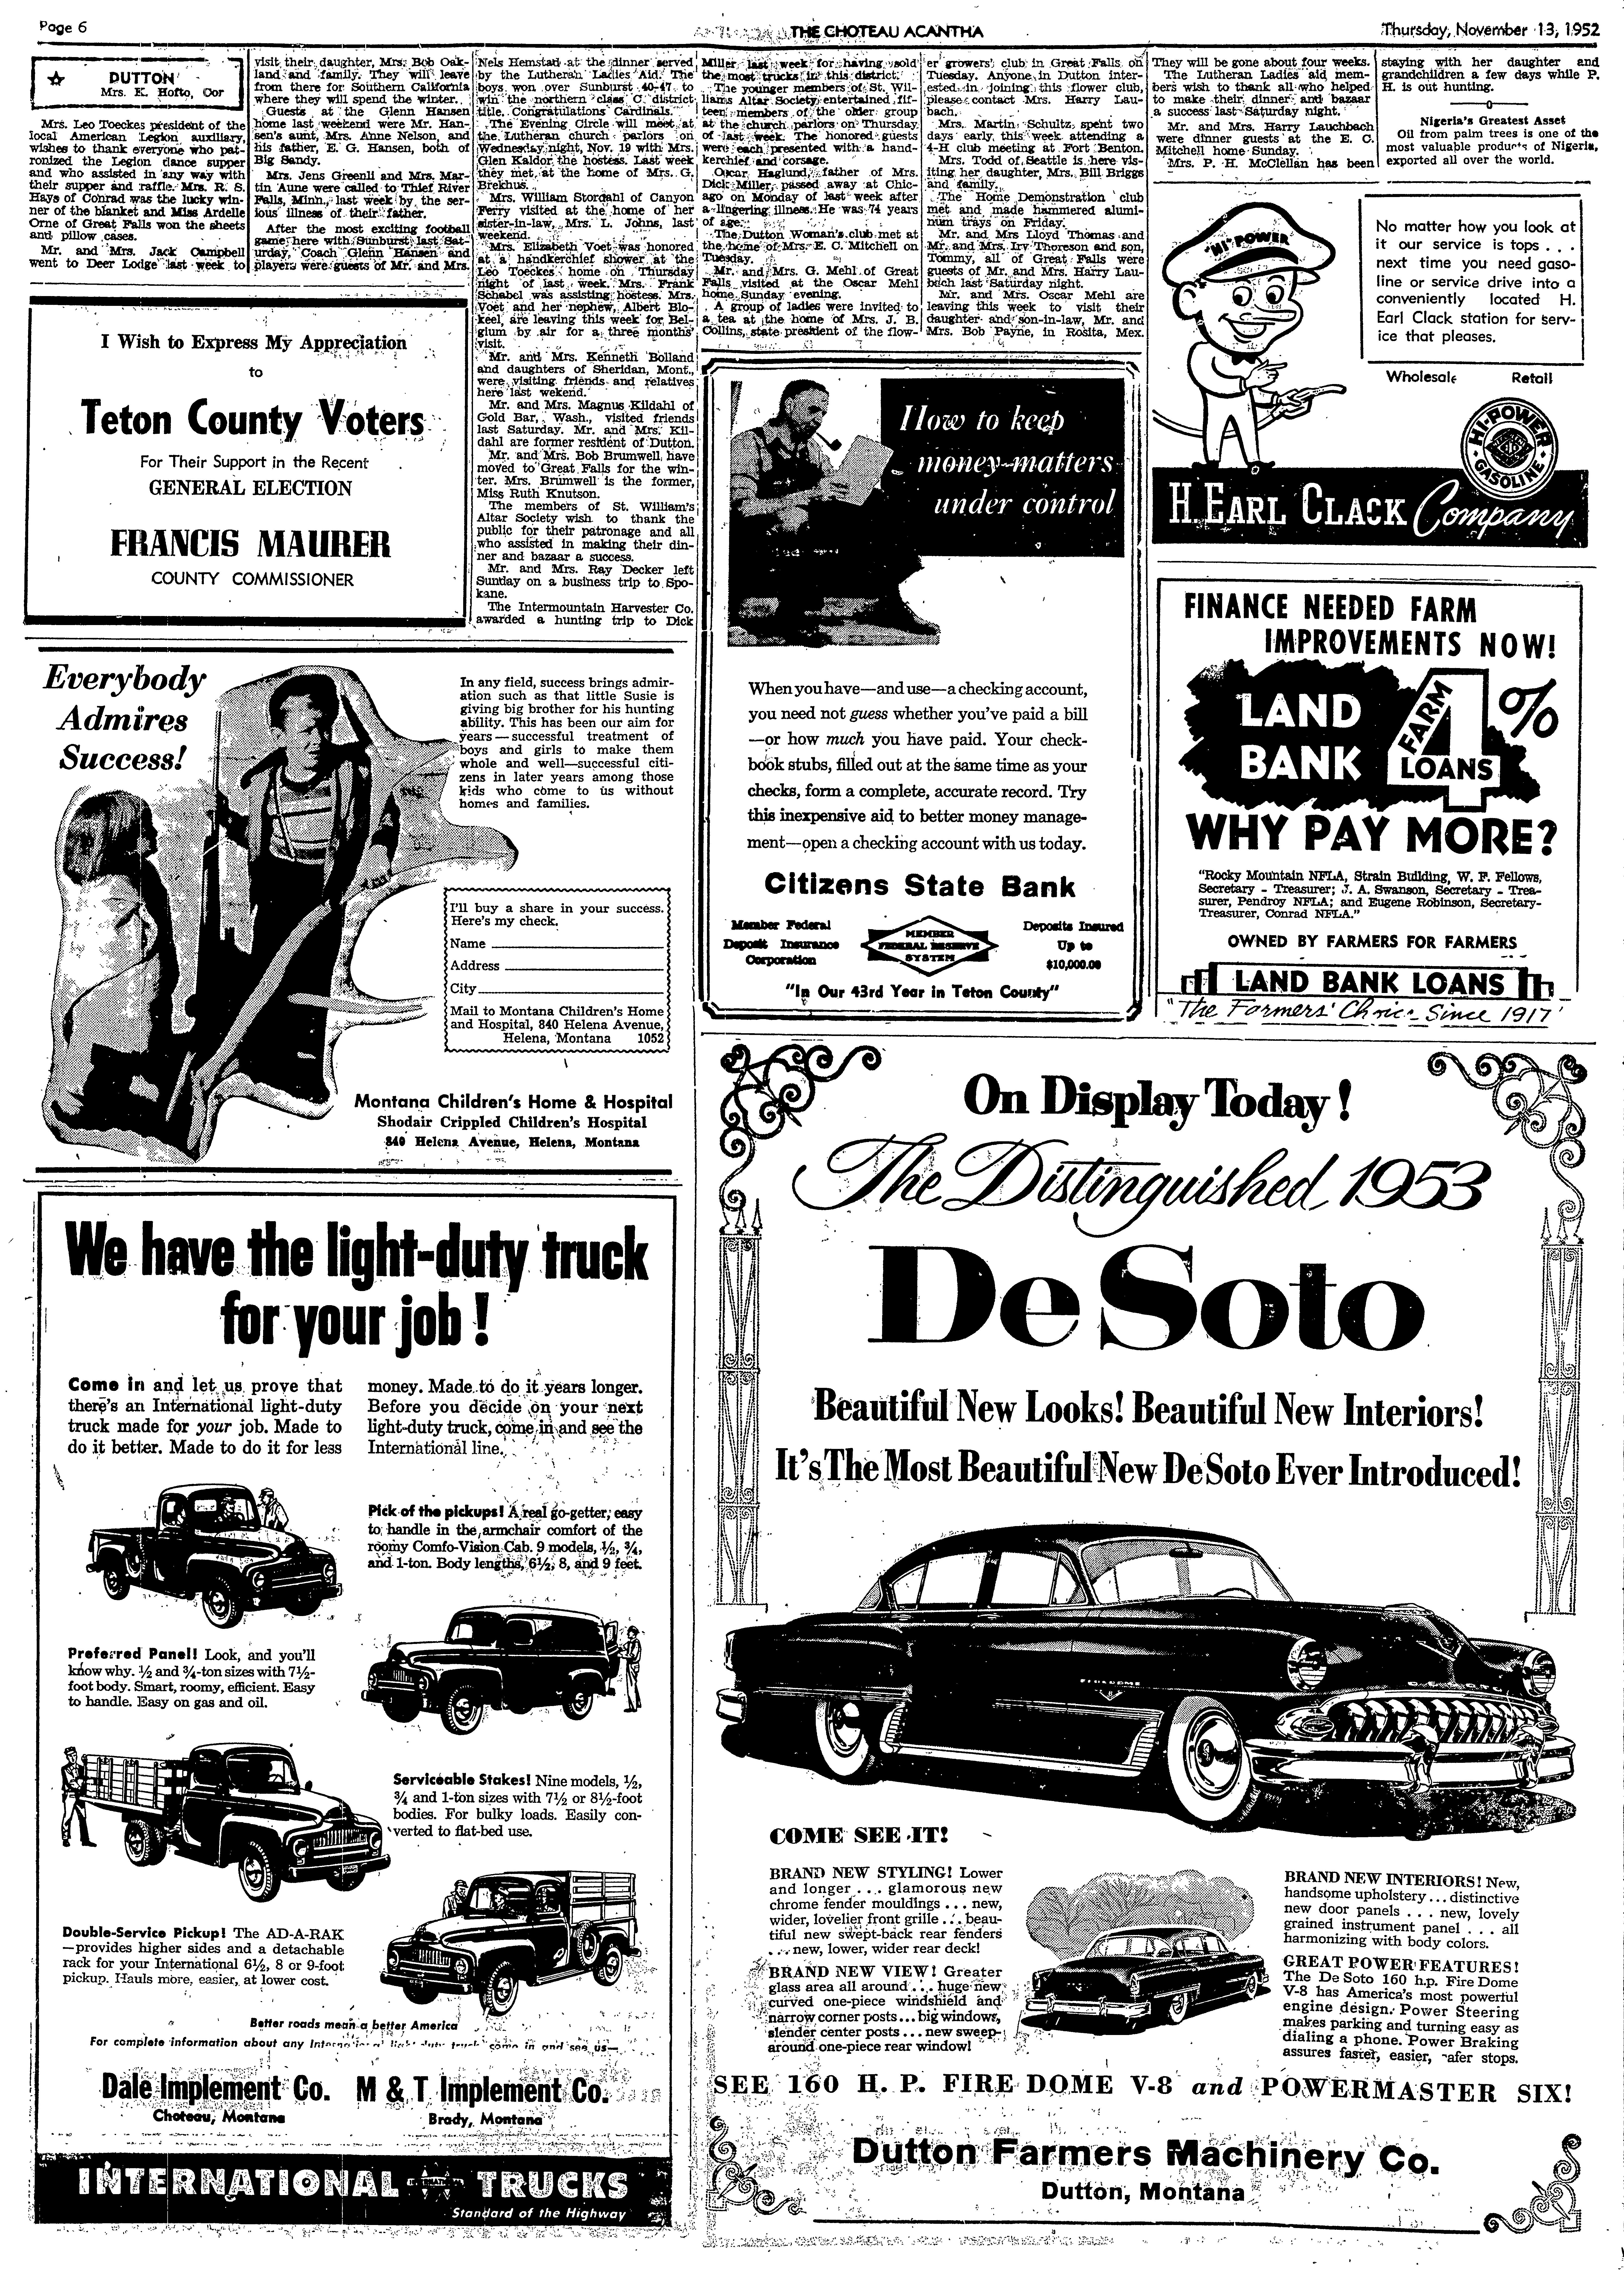 The Choteau Acantha (Choteau, Mont ) 1904-current, November 13, 1952